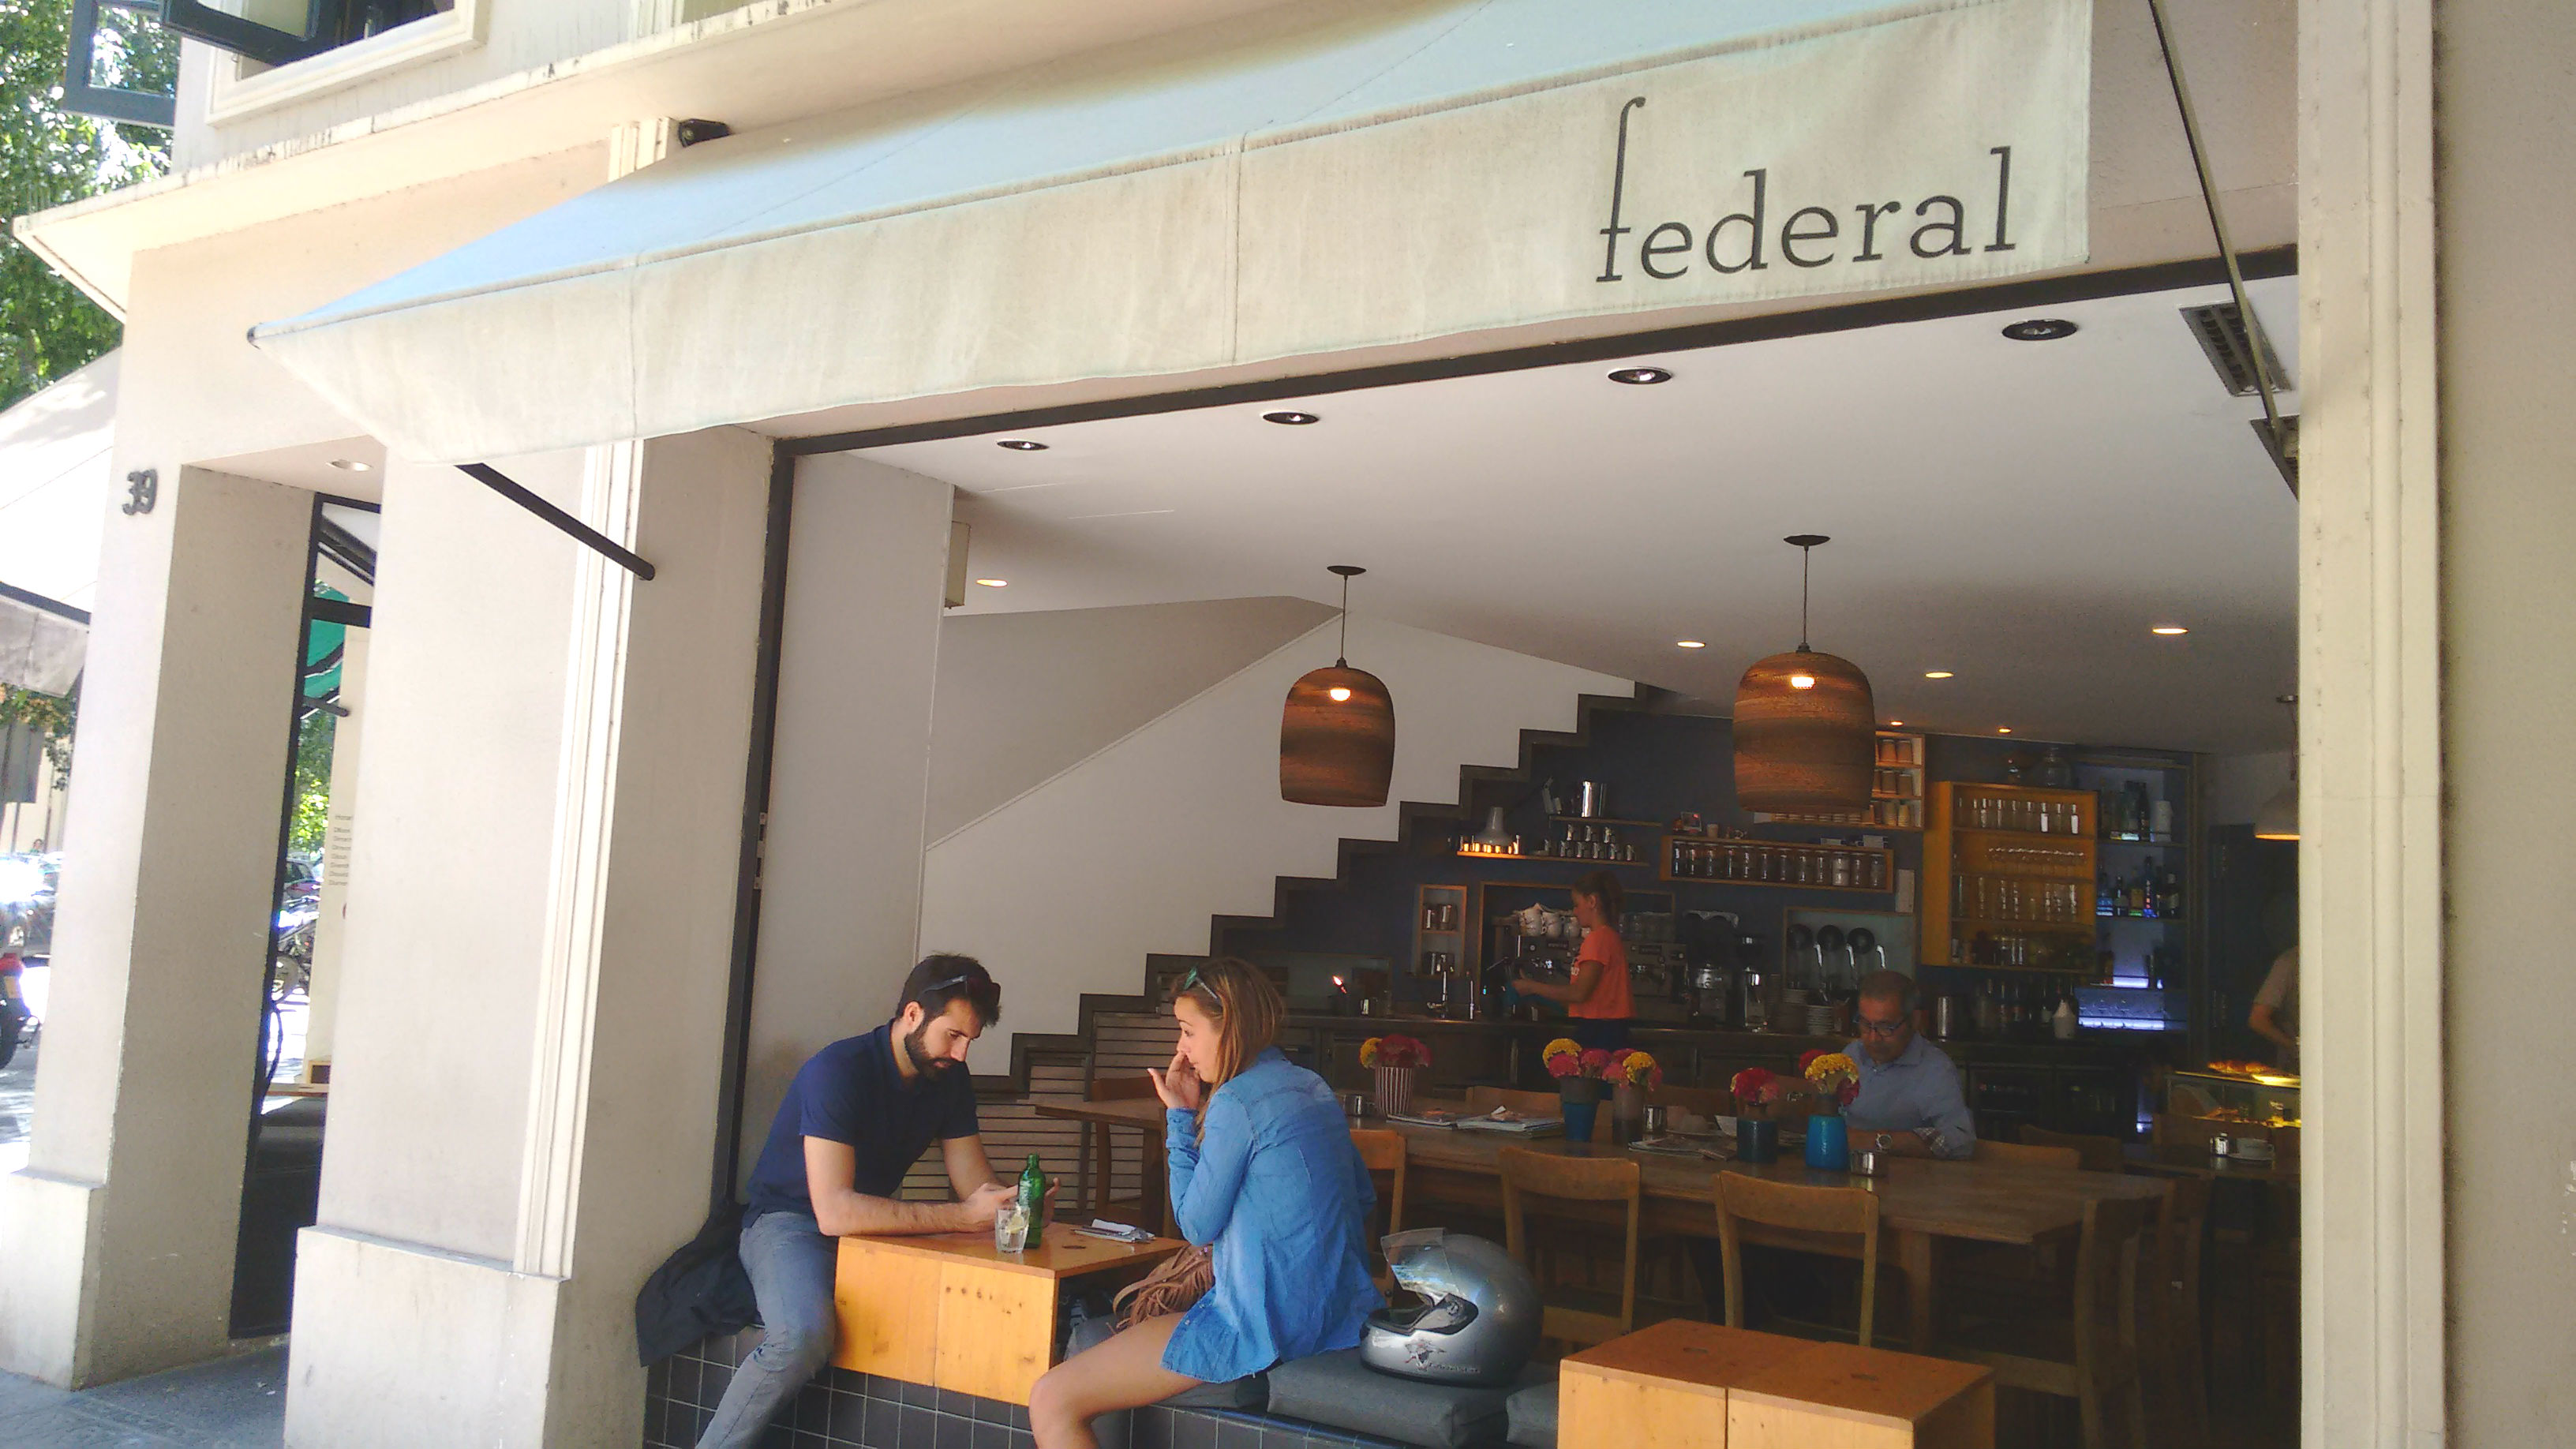 La Federal café